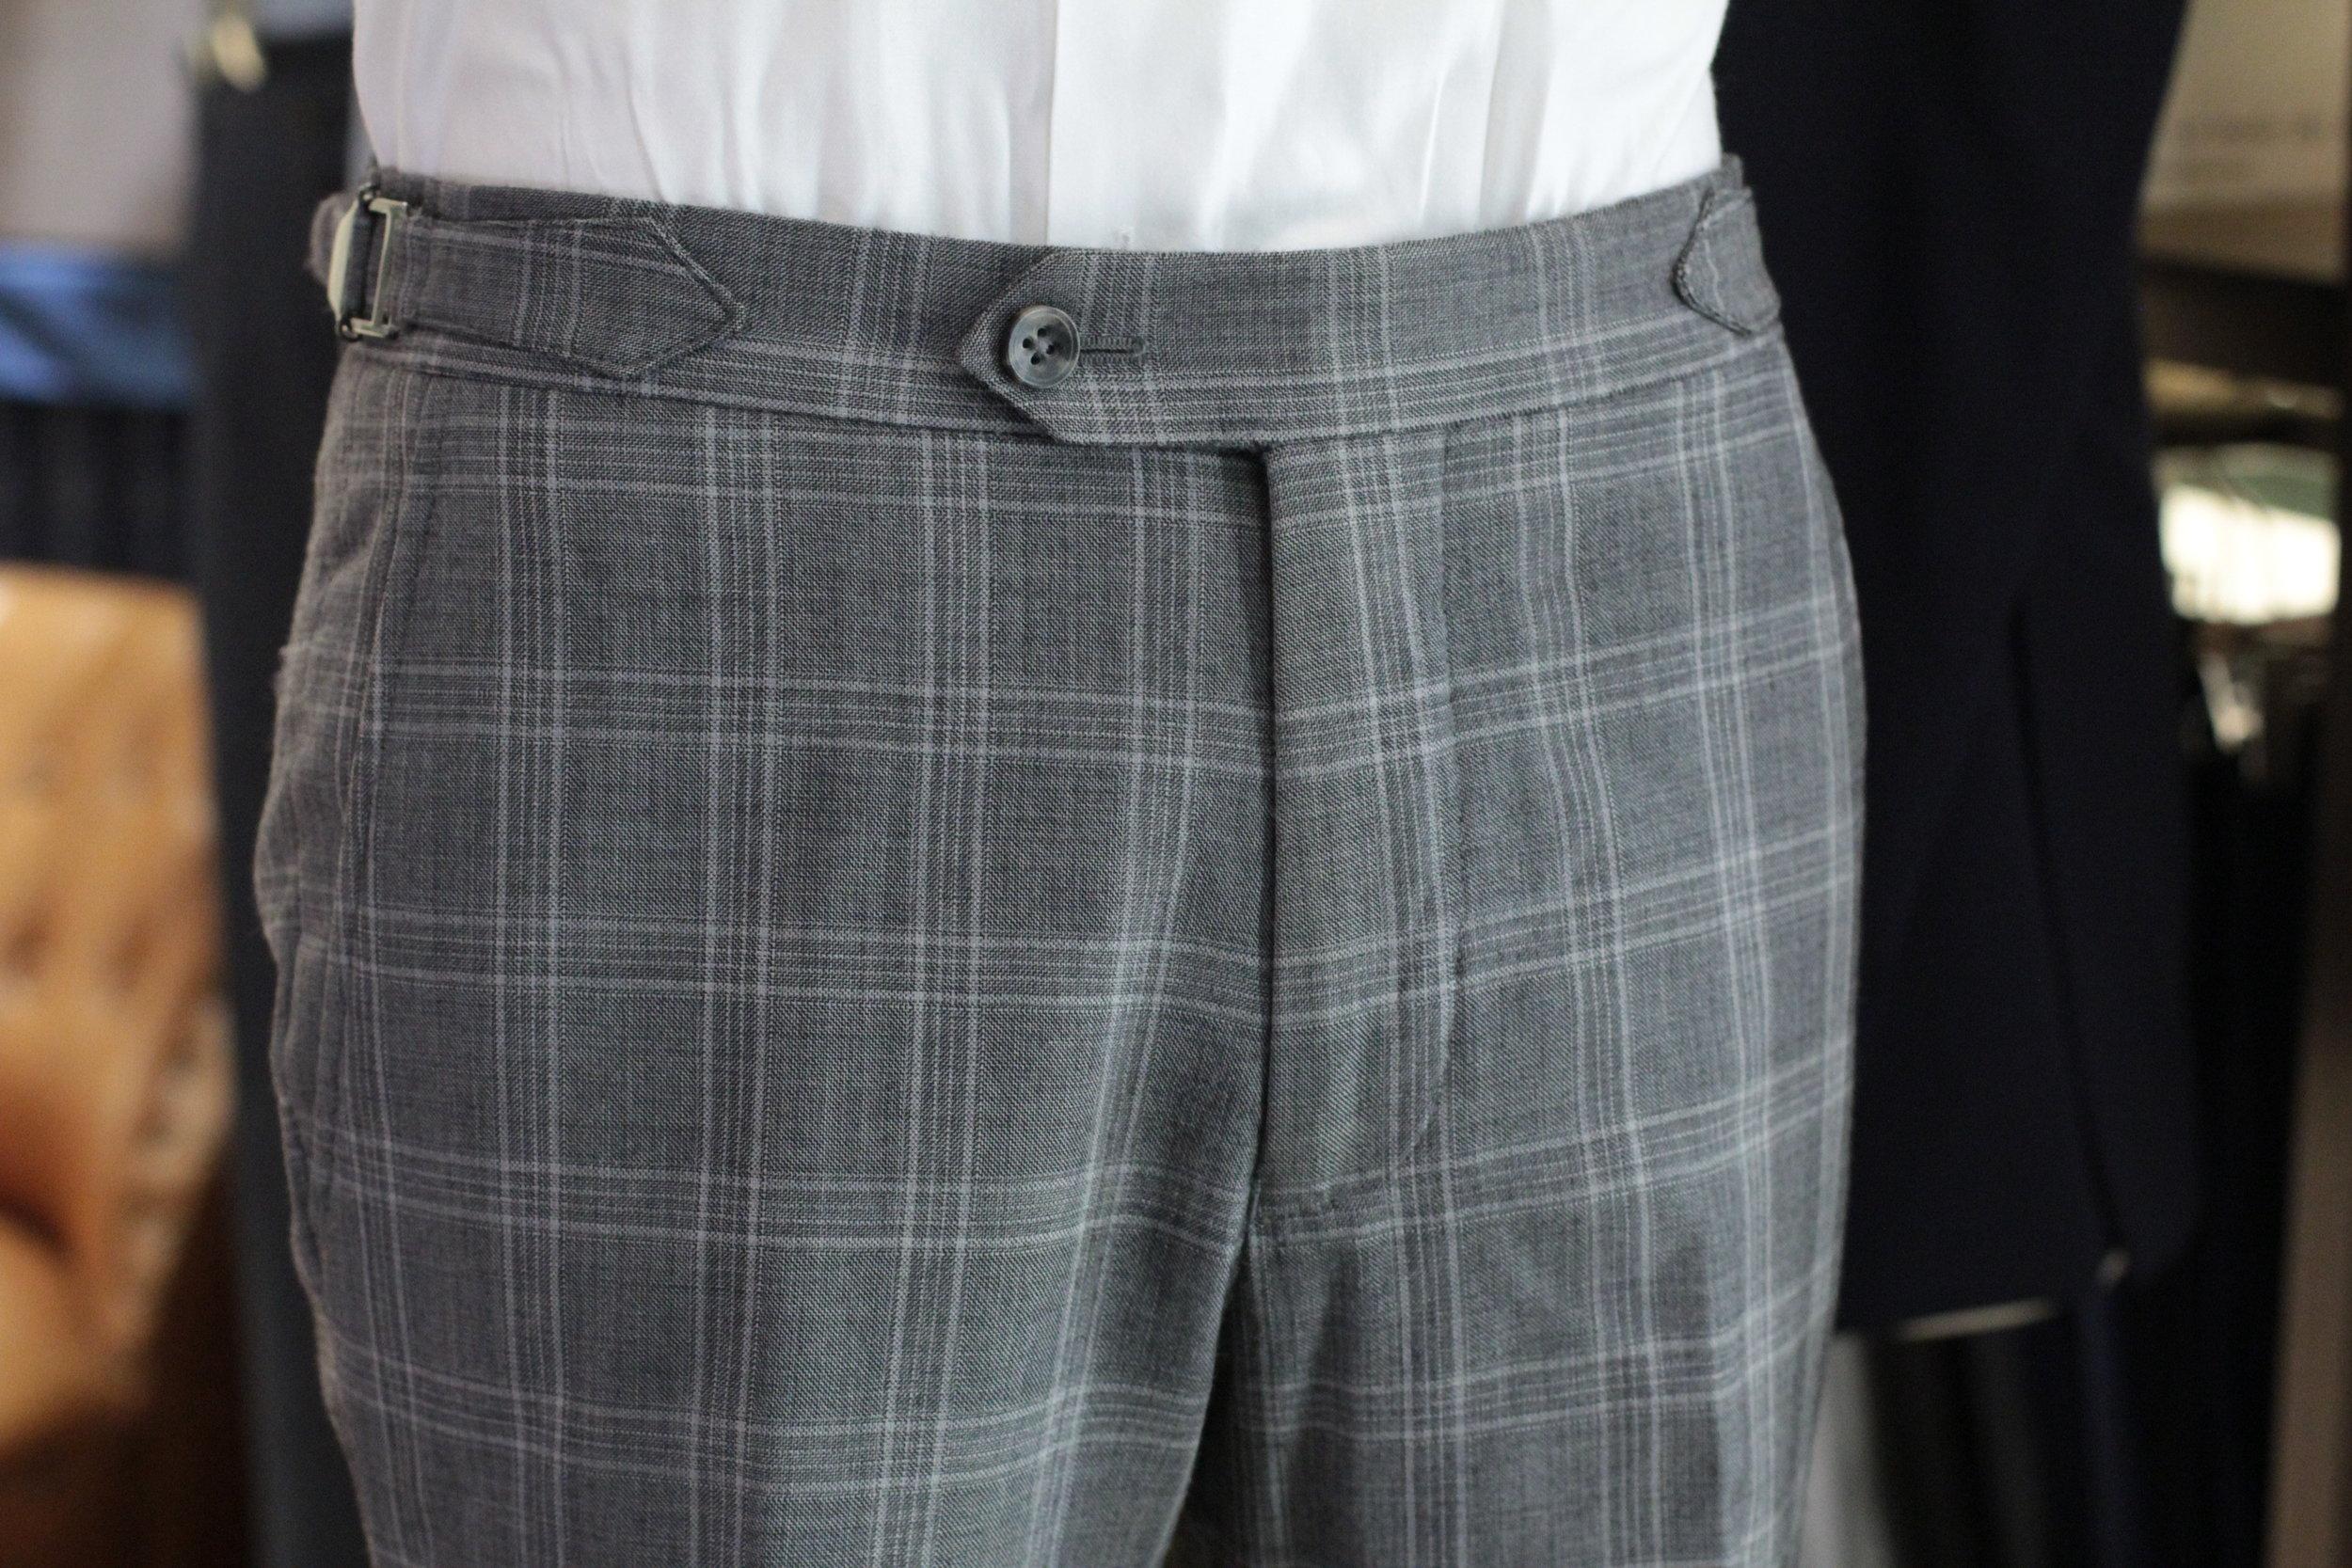 Super 110 Vitale Barberis Canonico Grey Glen Checks Trousers Bespoke Trousers | MadeSuits back pocket front.JPG